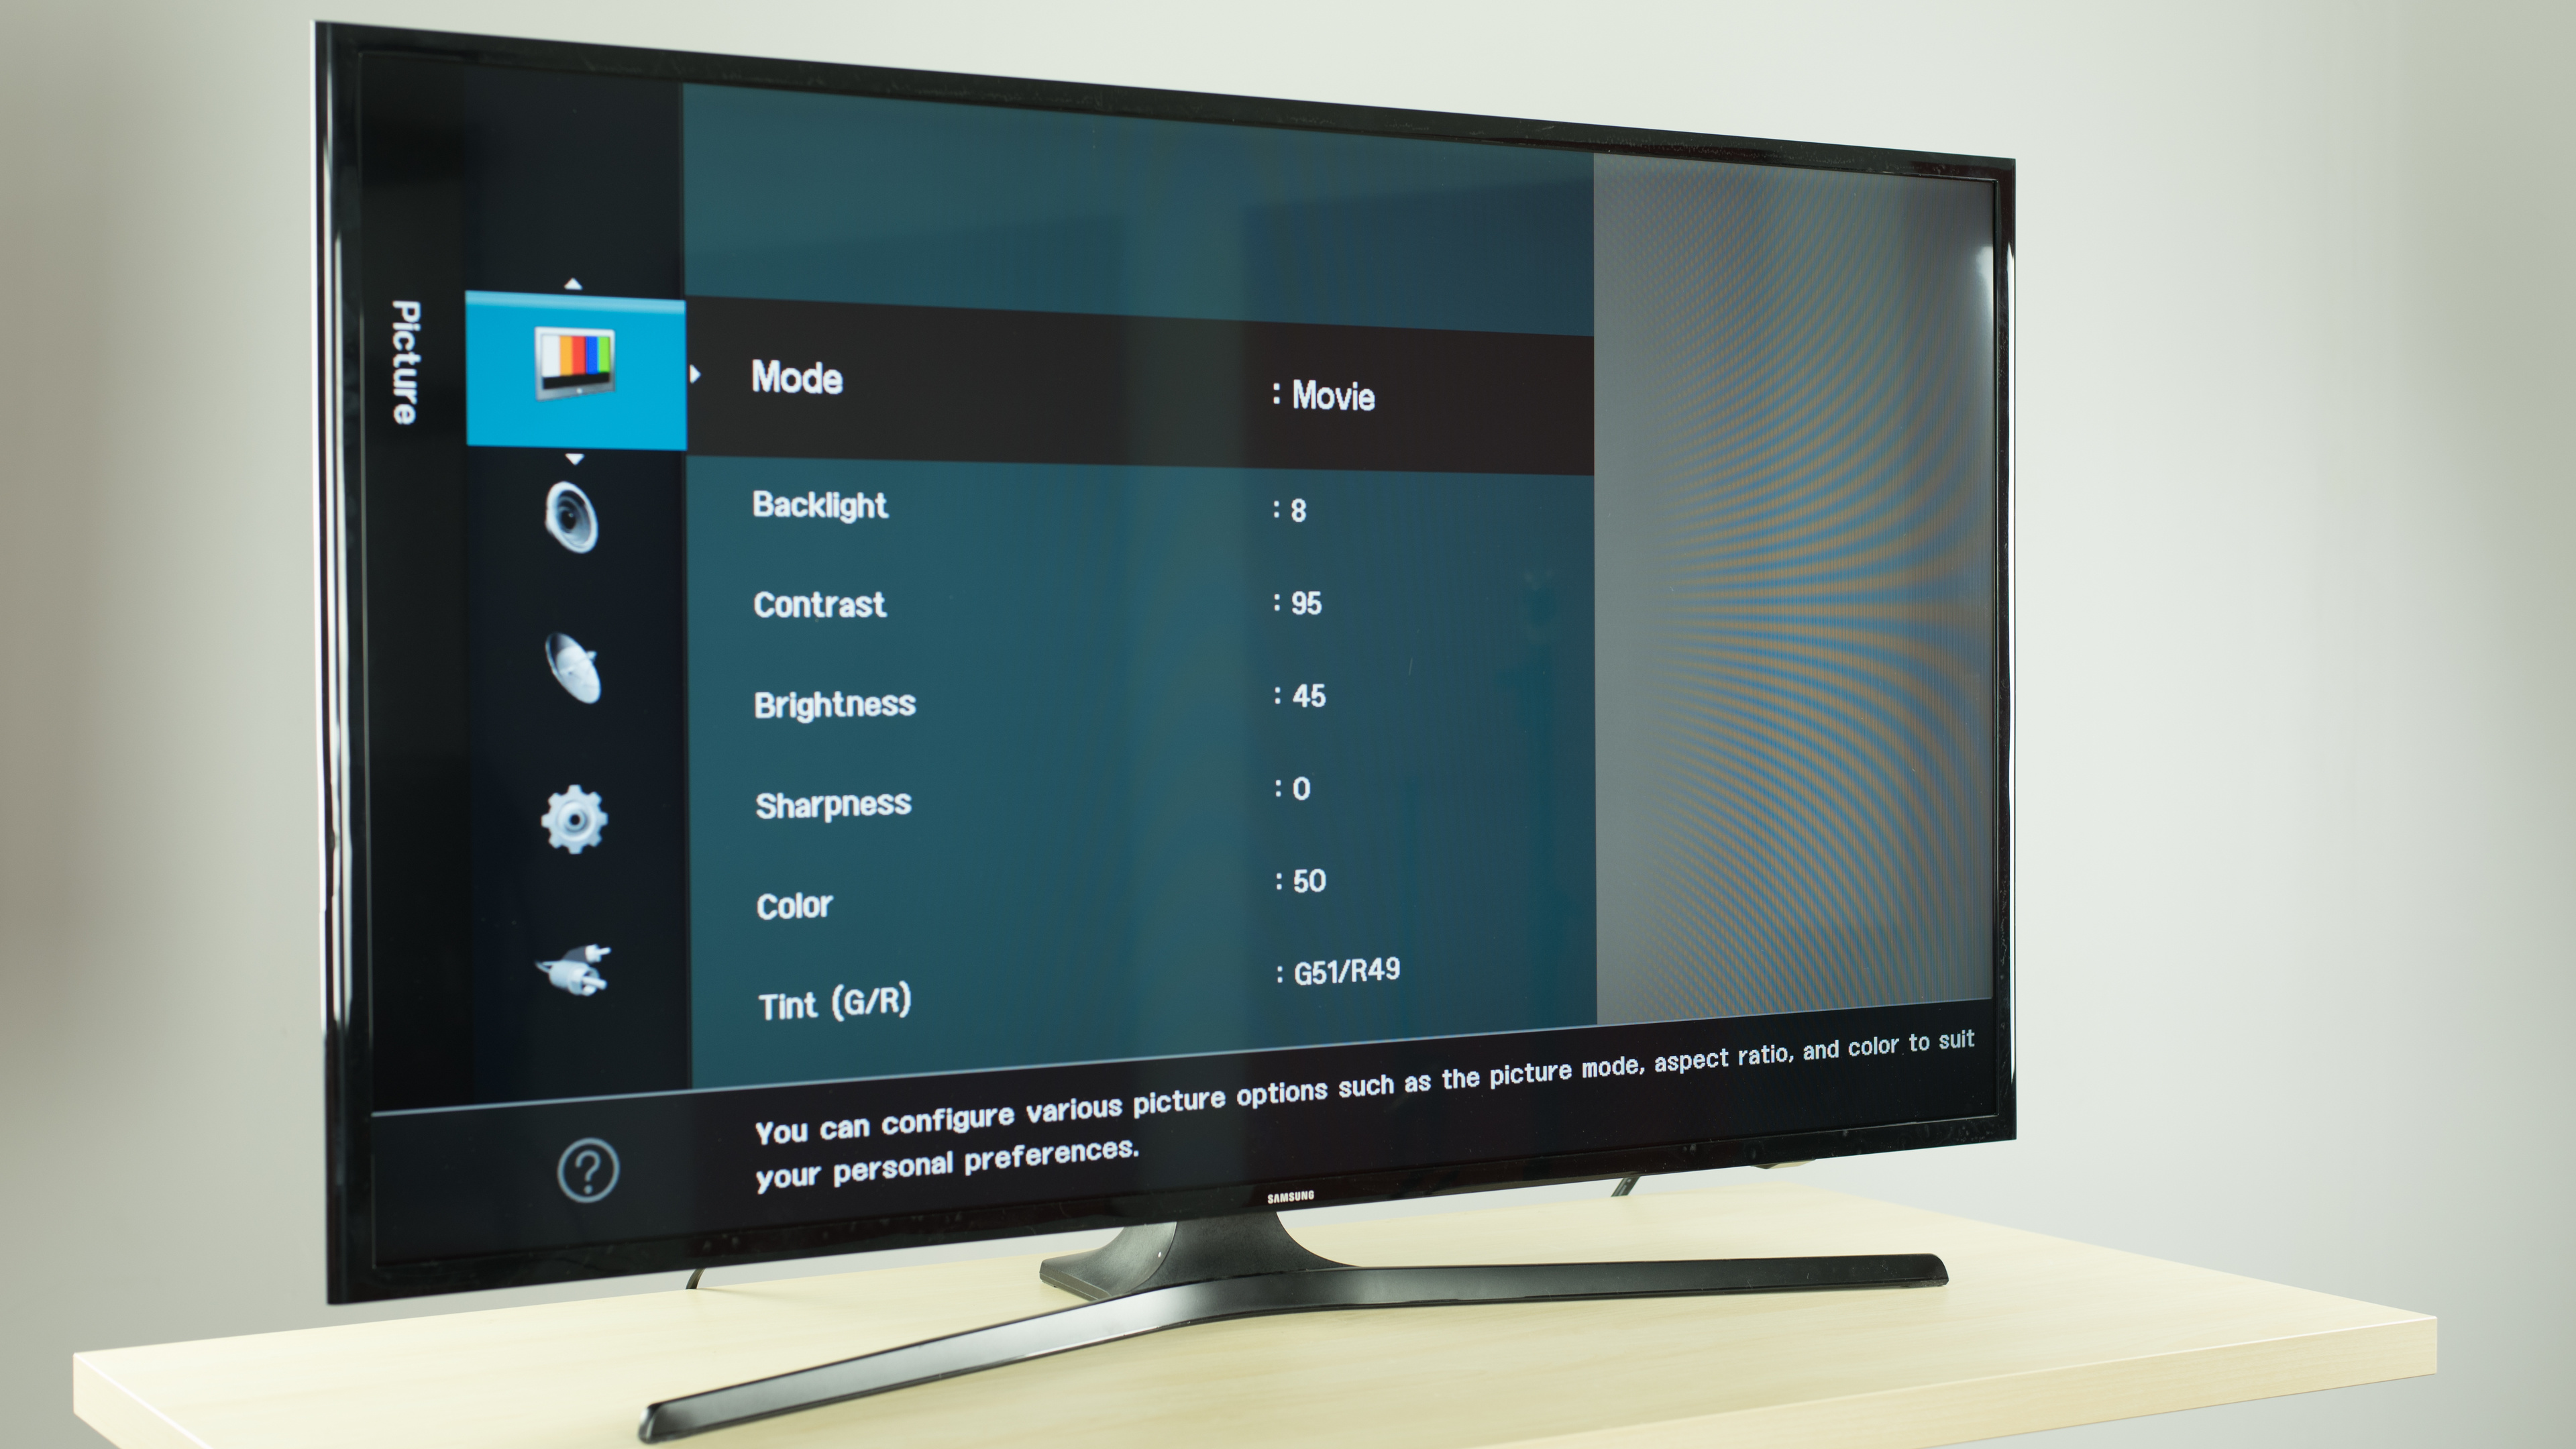 samsung j5000 review un32j5003 un43j5000 un48j5000 un50j5000. Black Bedroom Furniture Sets. Home Design Ideas